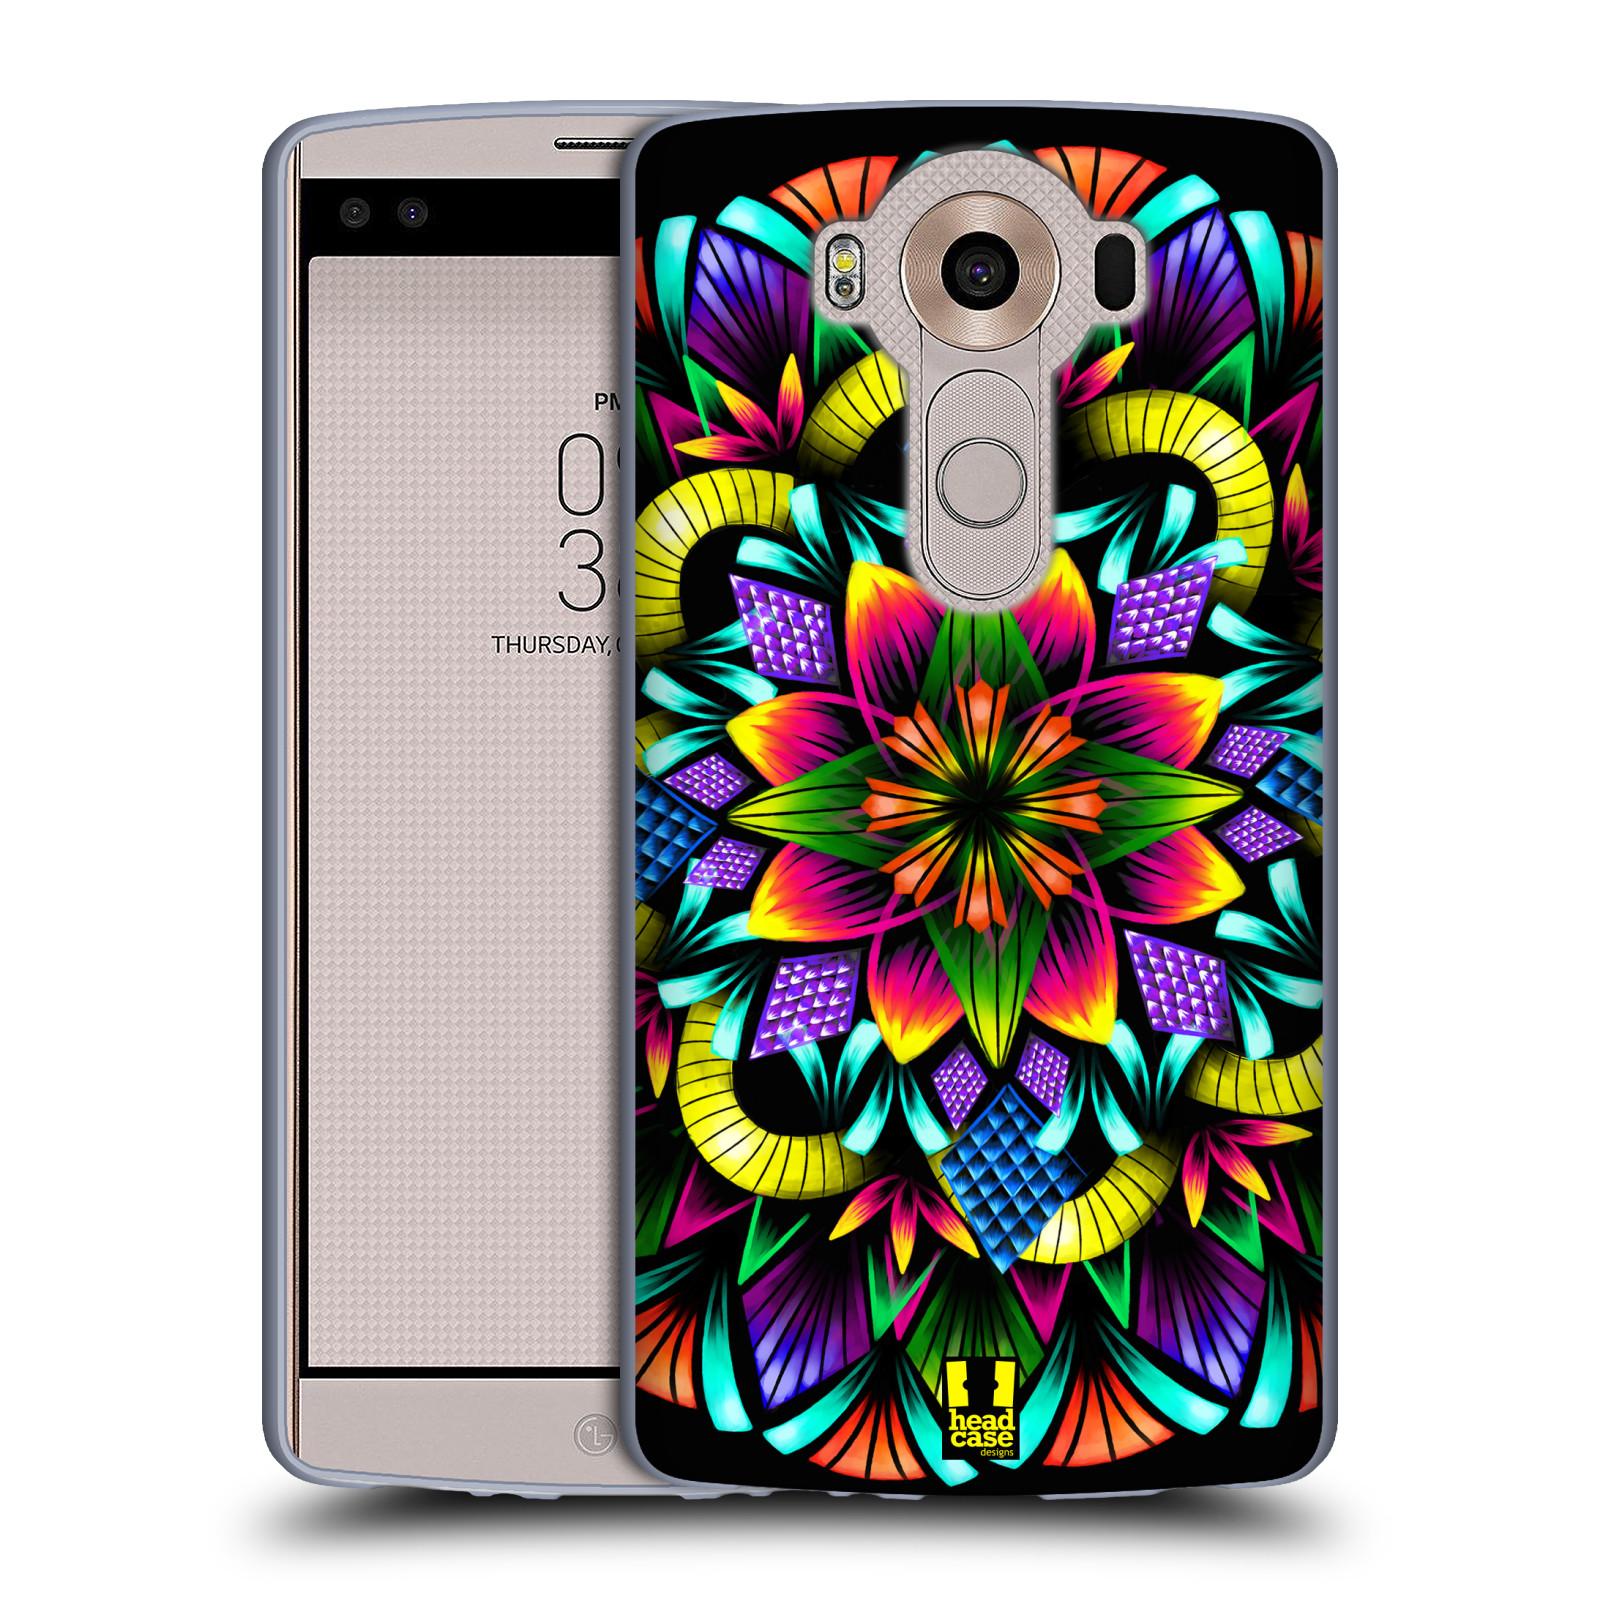 HEAD CASE silikonový obal na mobil LG V10 (H960A) vzor Indie Mandala kaleidoskop barevný vzor KVĚTINA